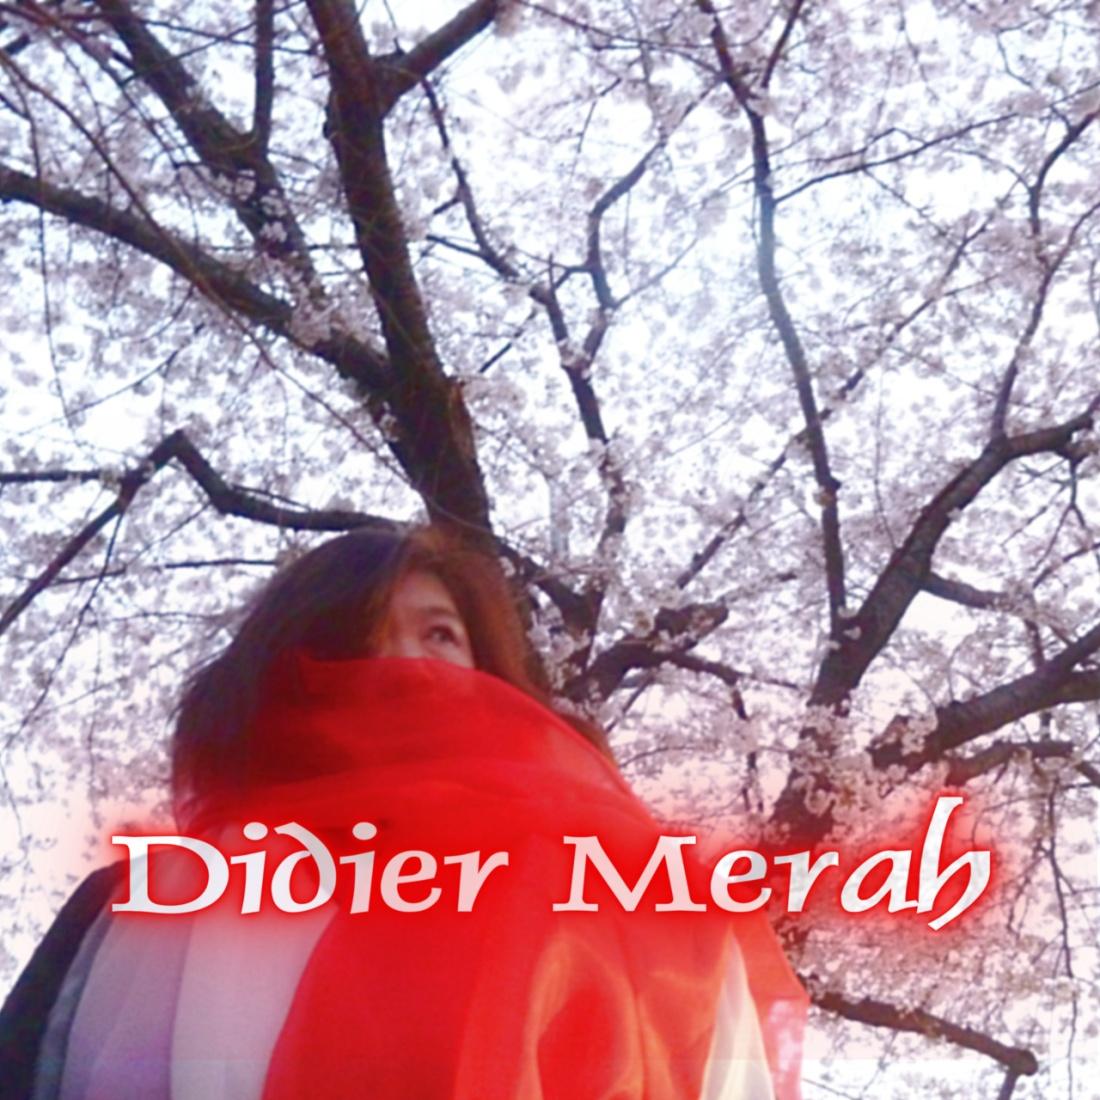 DidierMerah_20180331_1280x1280